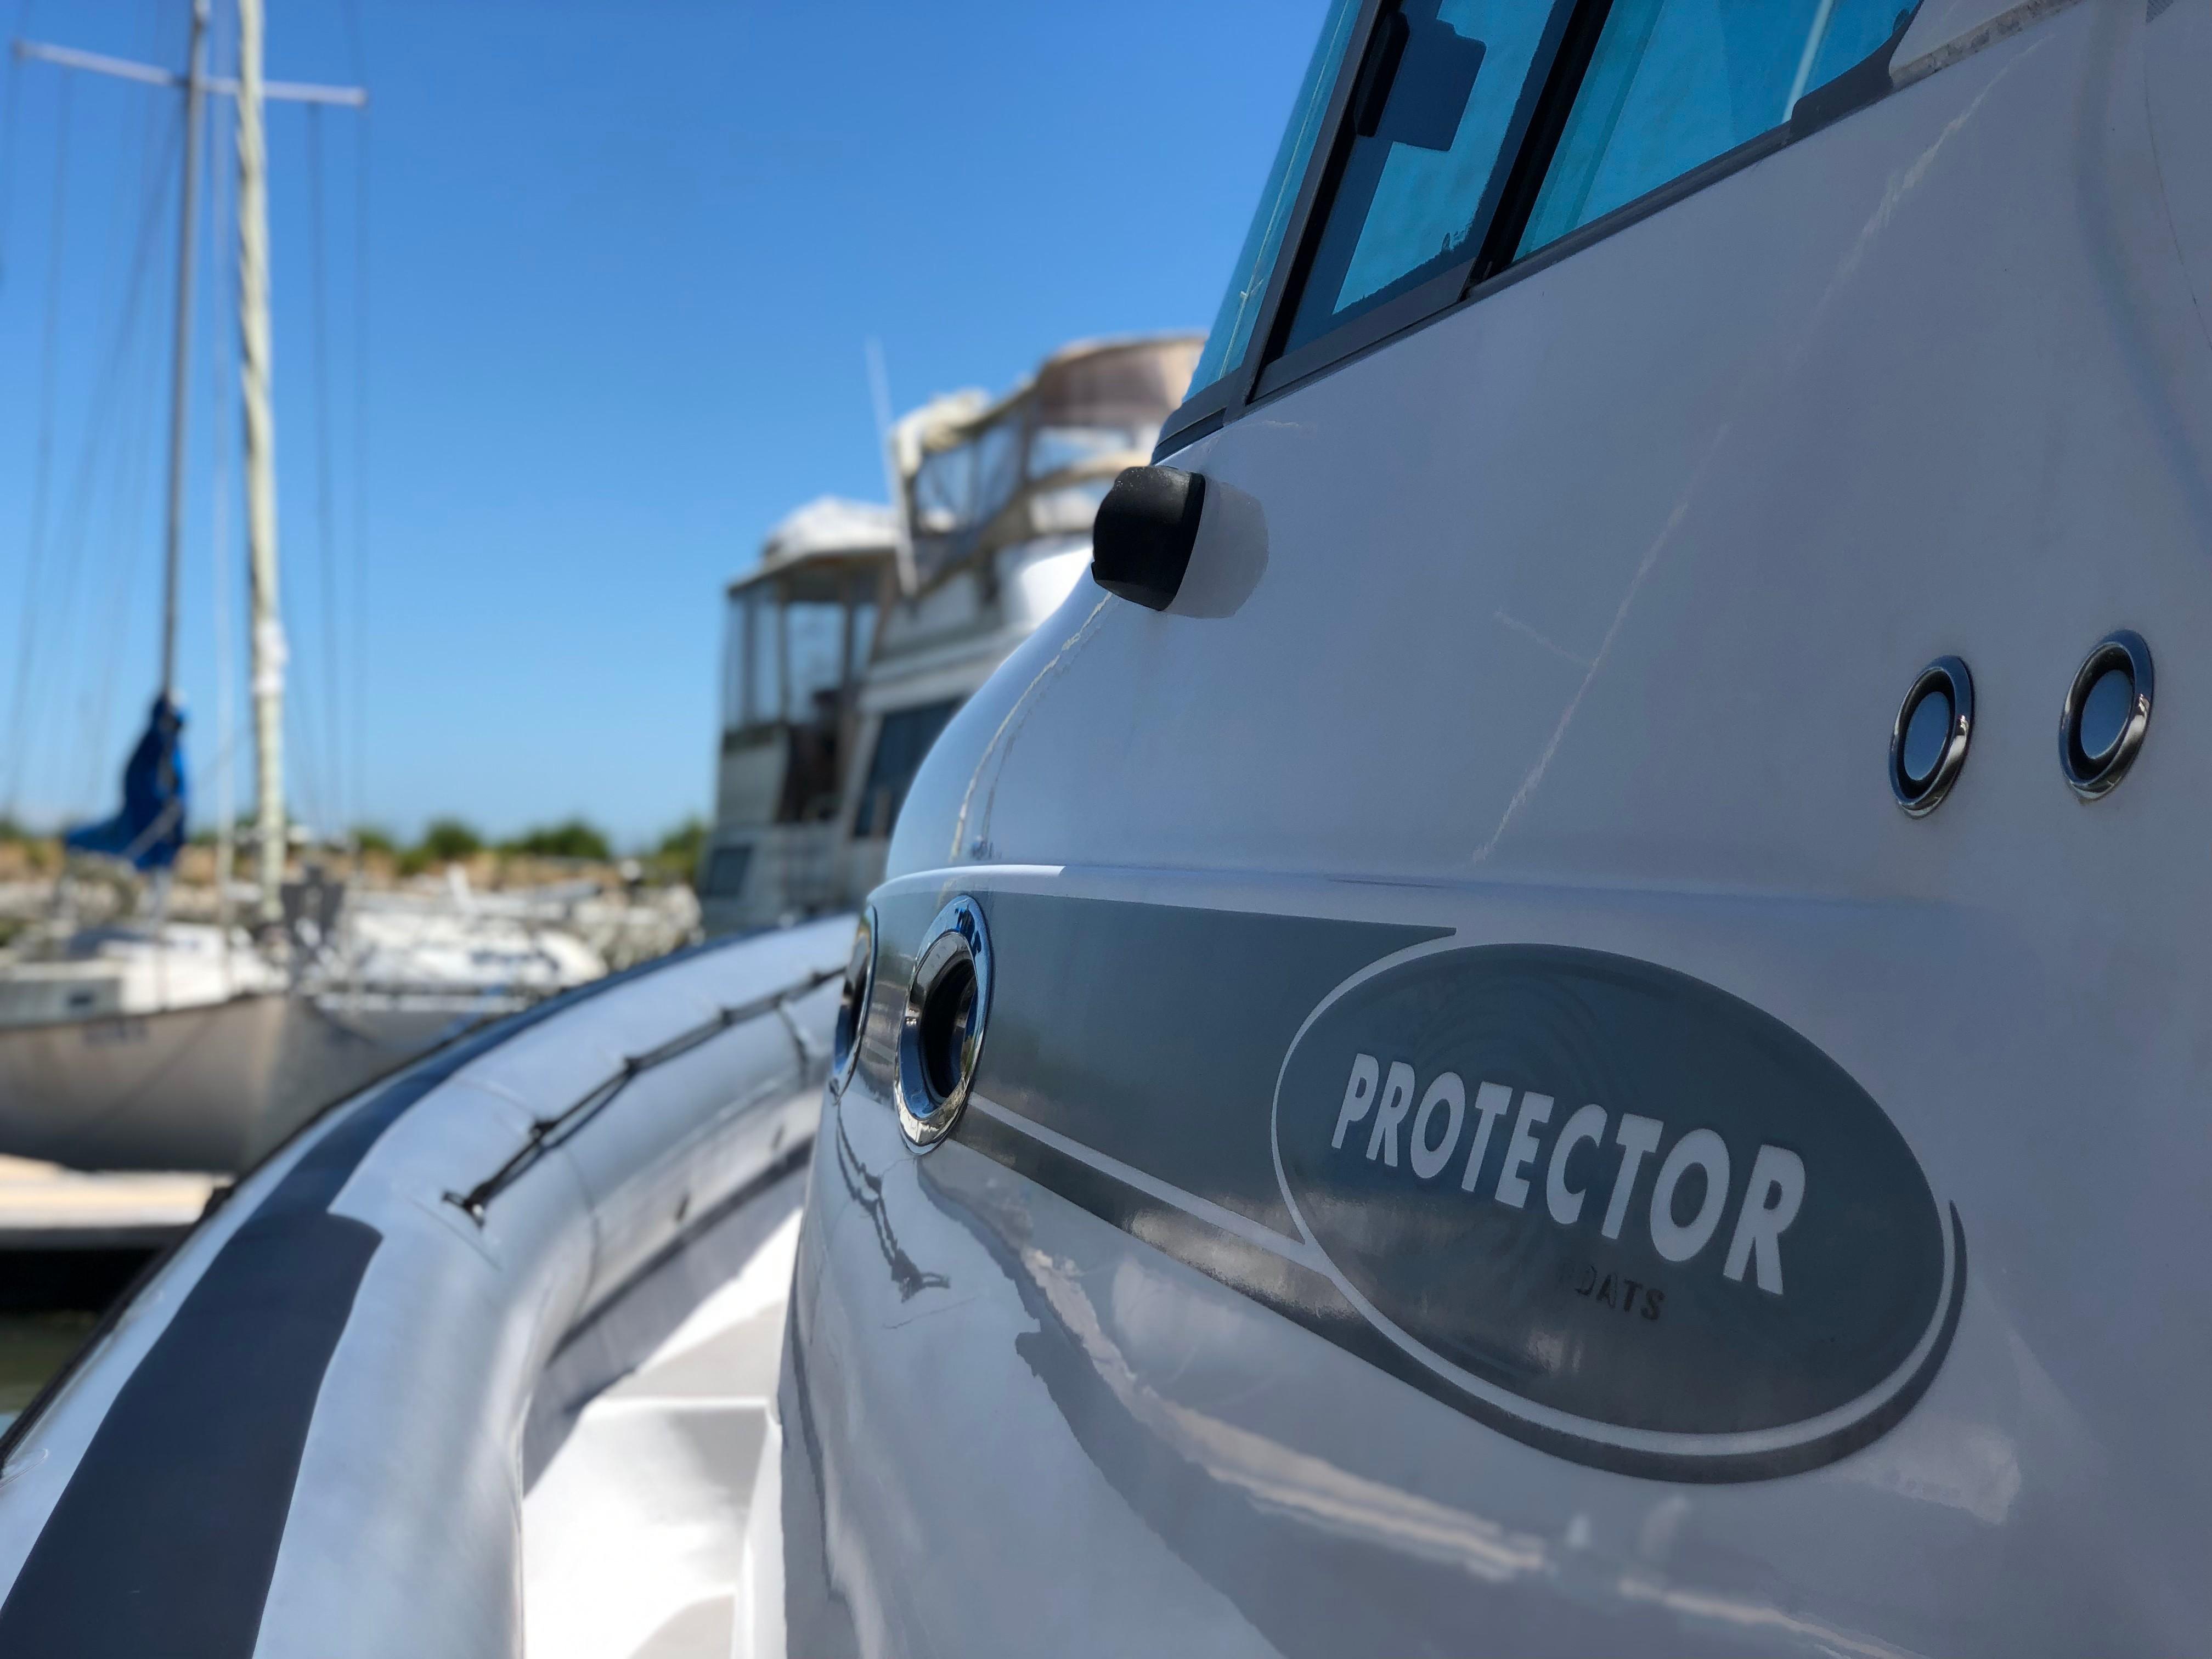 Protector - 50North